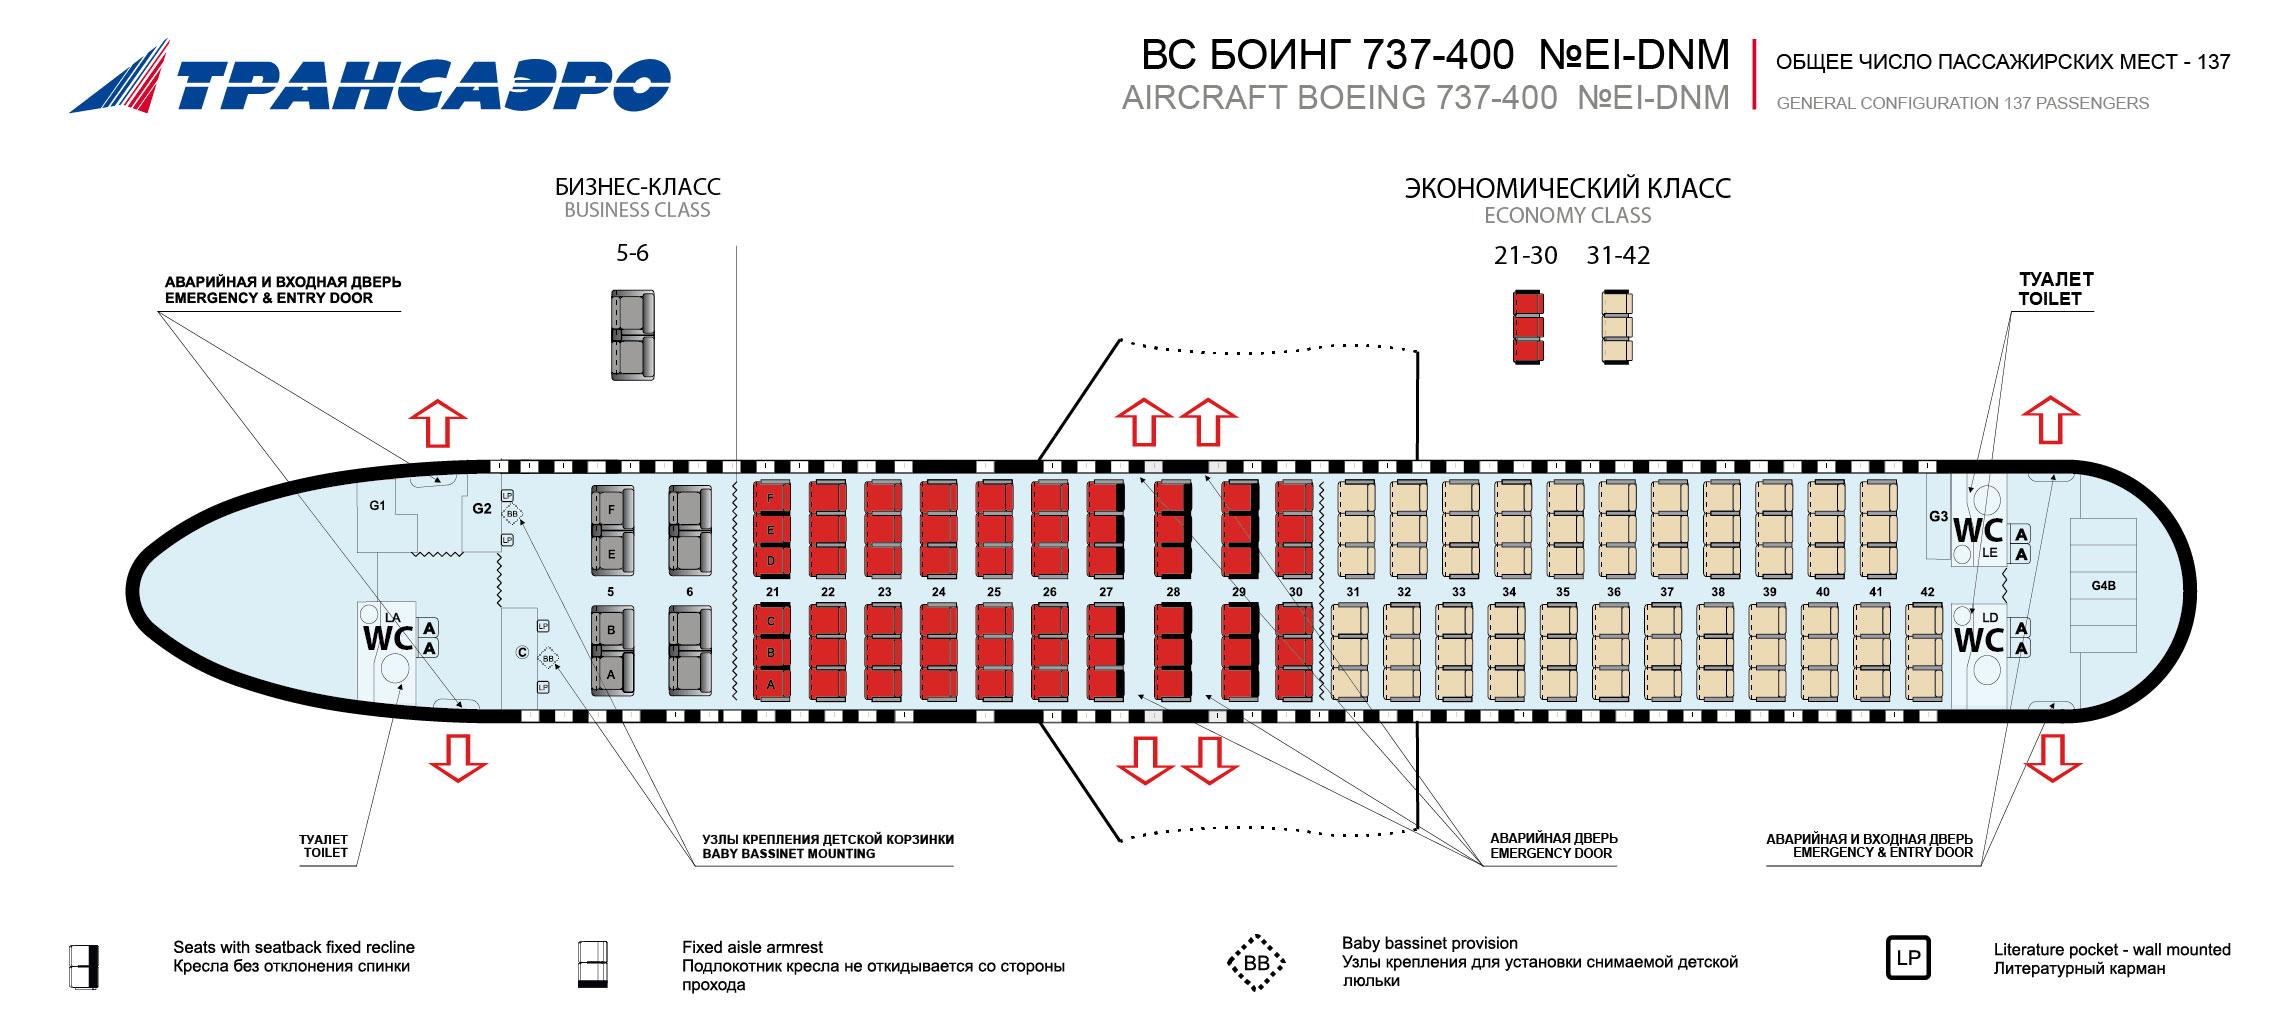 Боинг 737-800 схема мест алроса